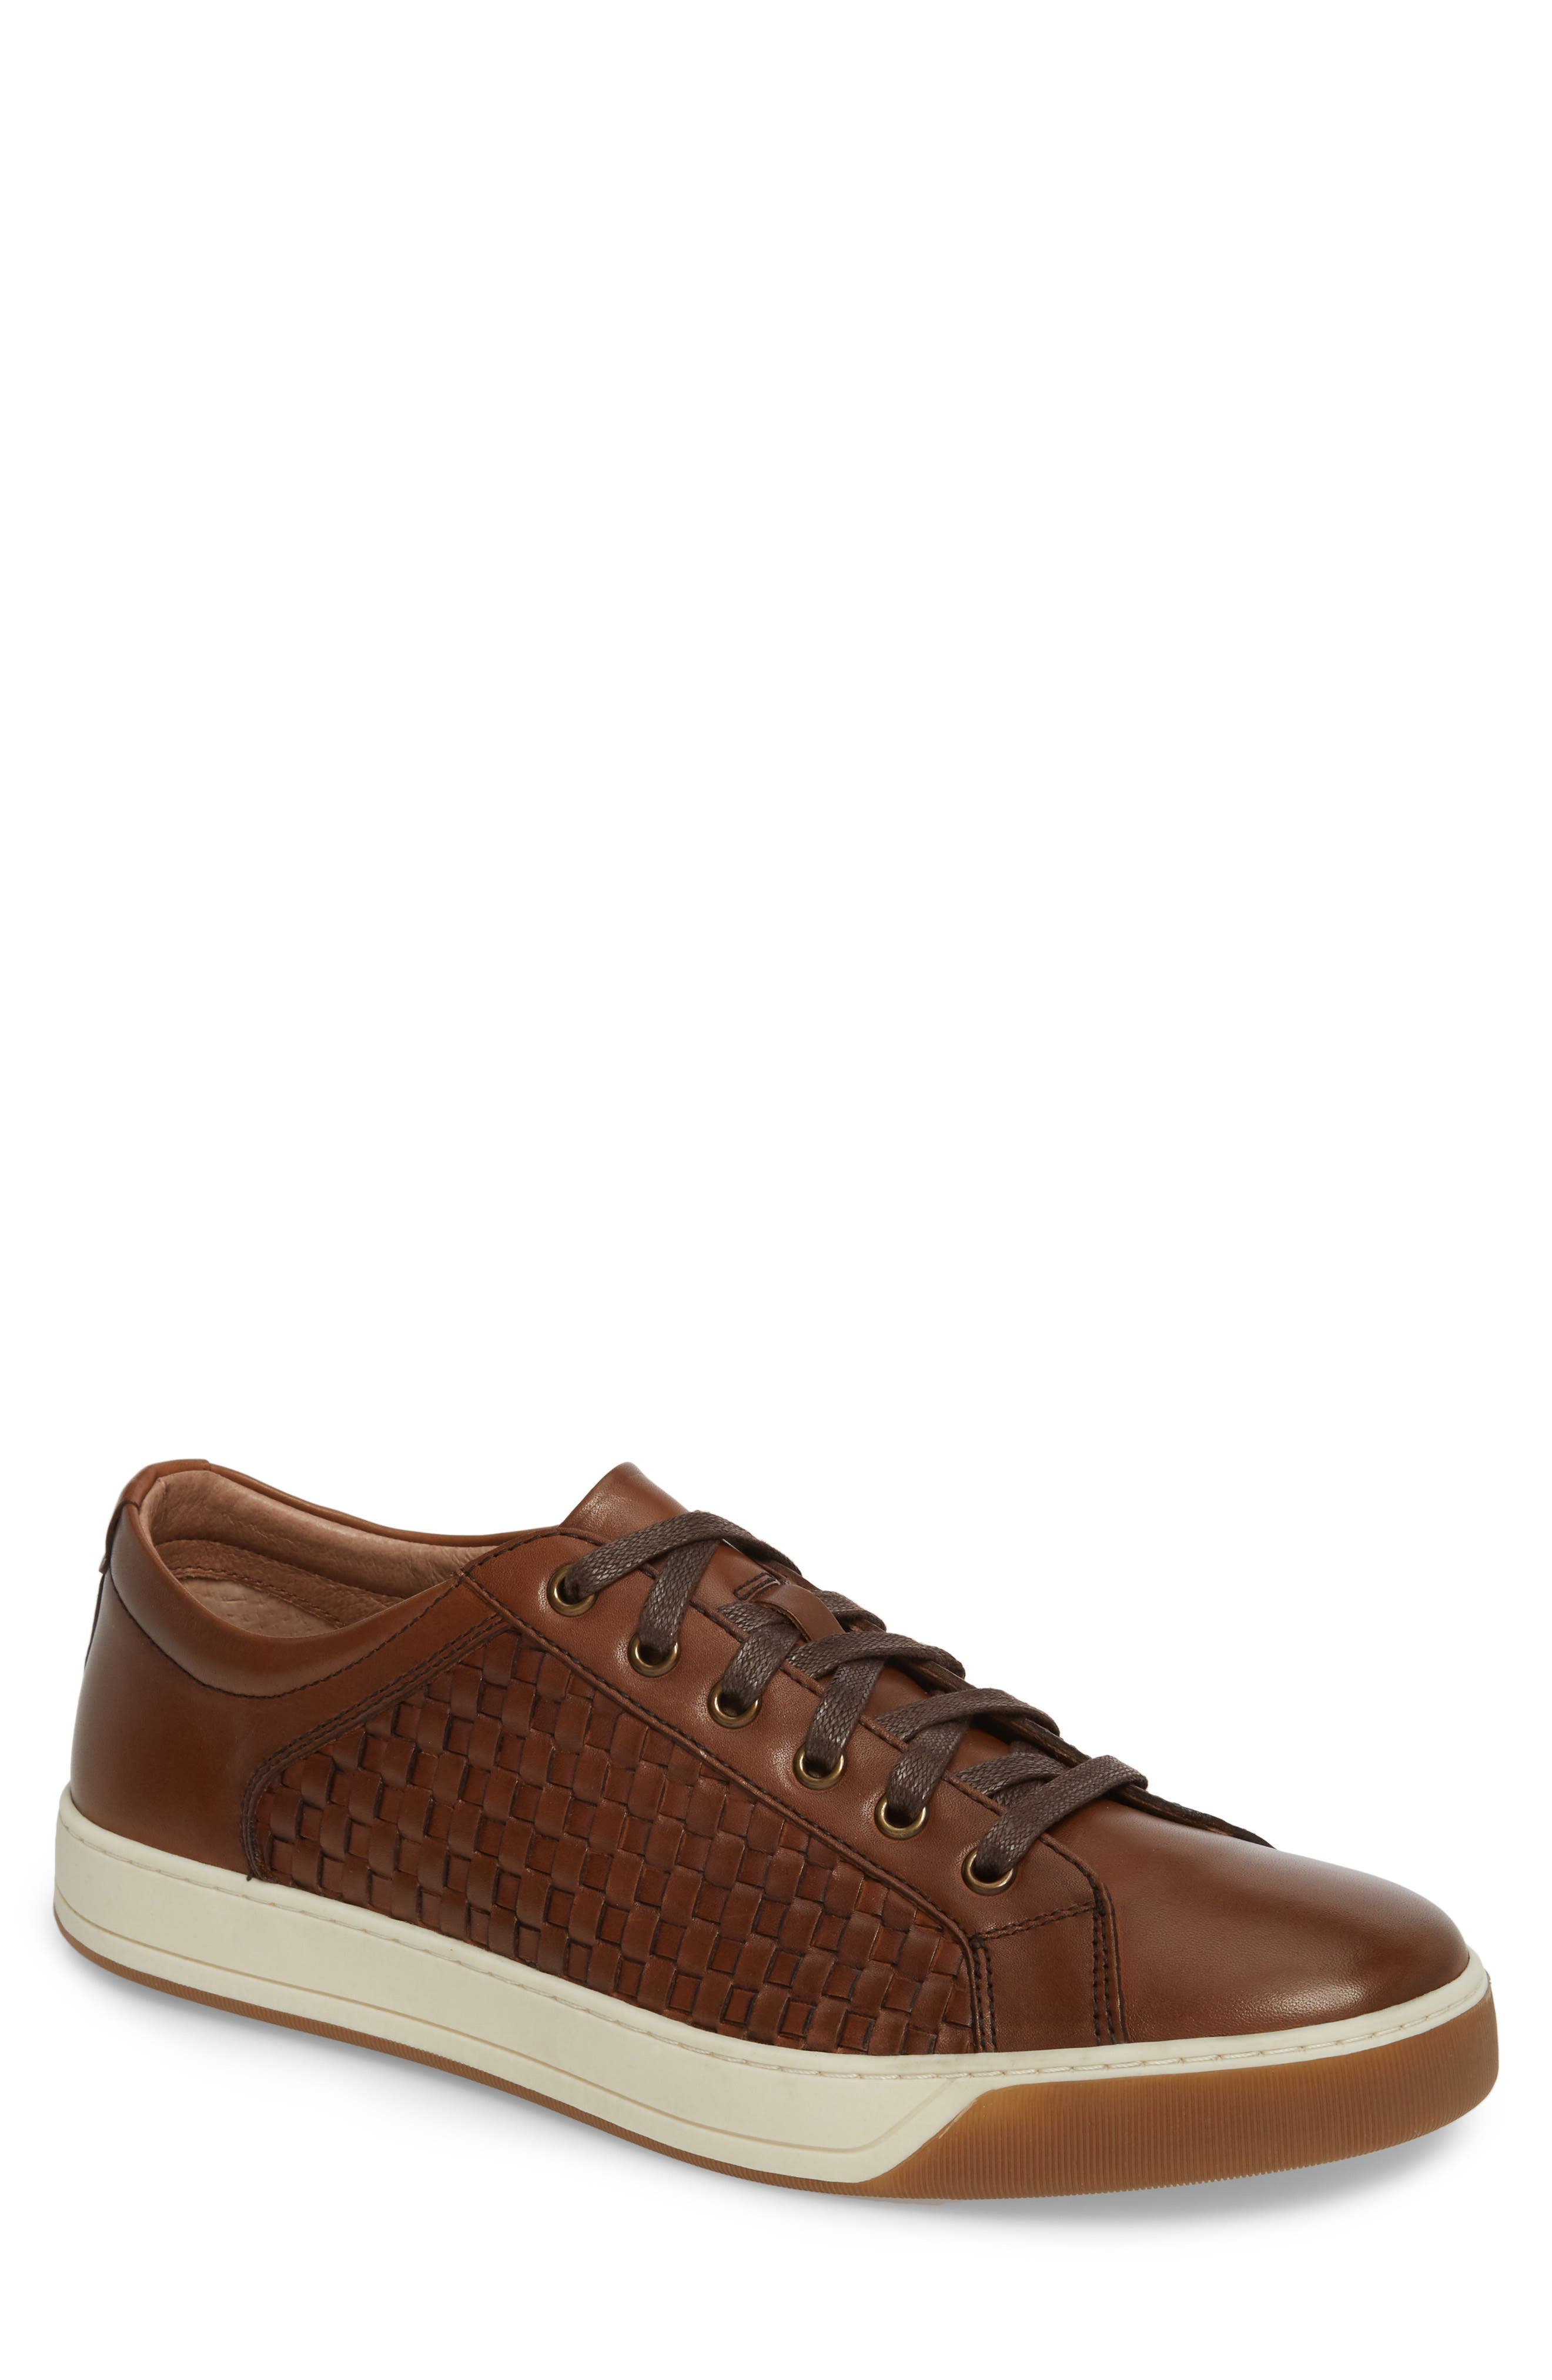 Allister Woven Low Top Sneaker,                         Main,                         color, Brown